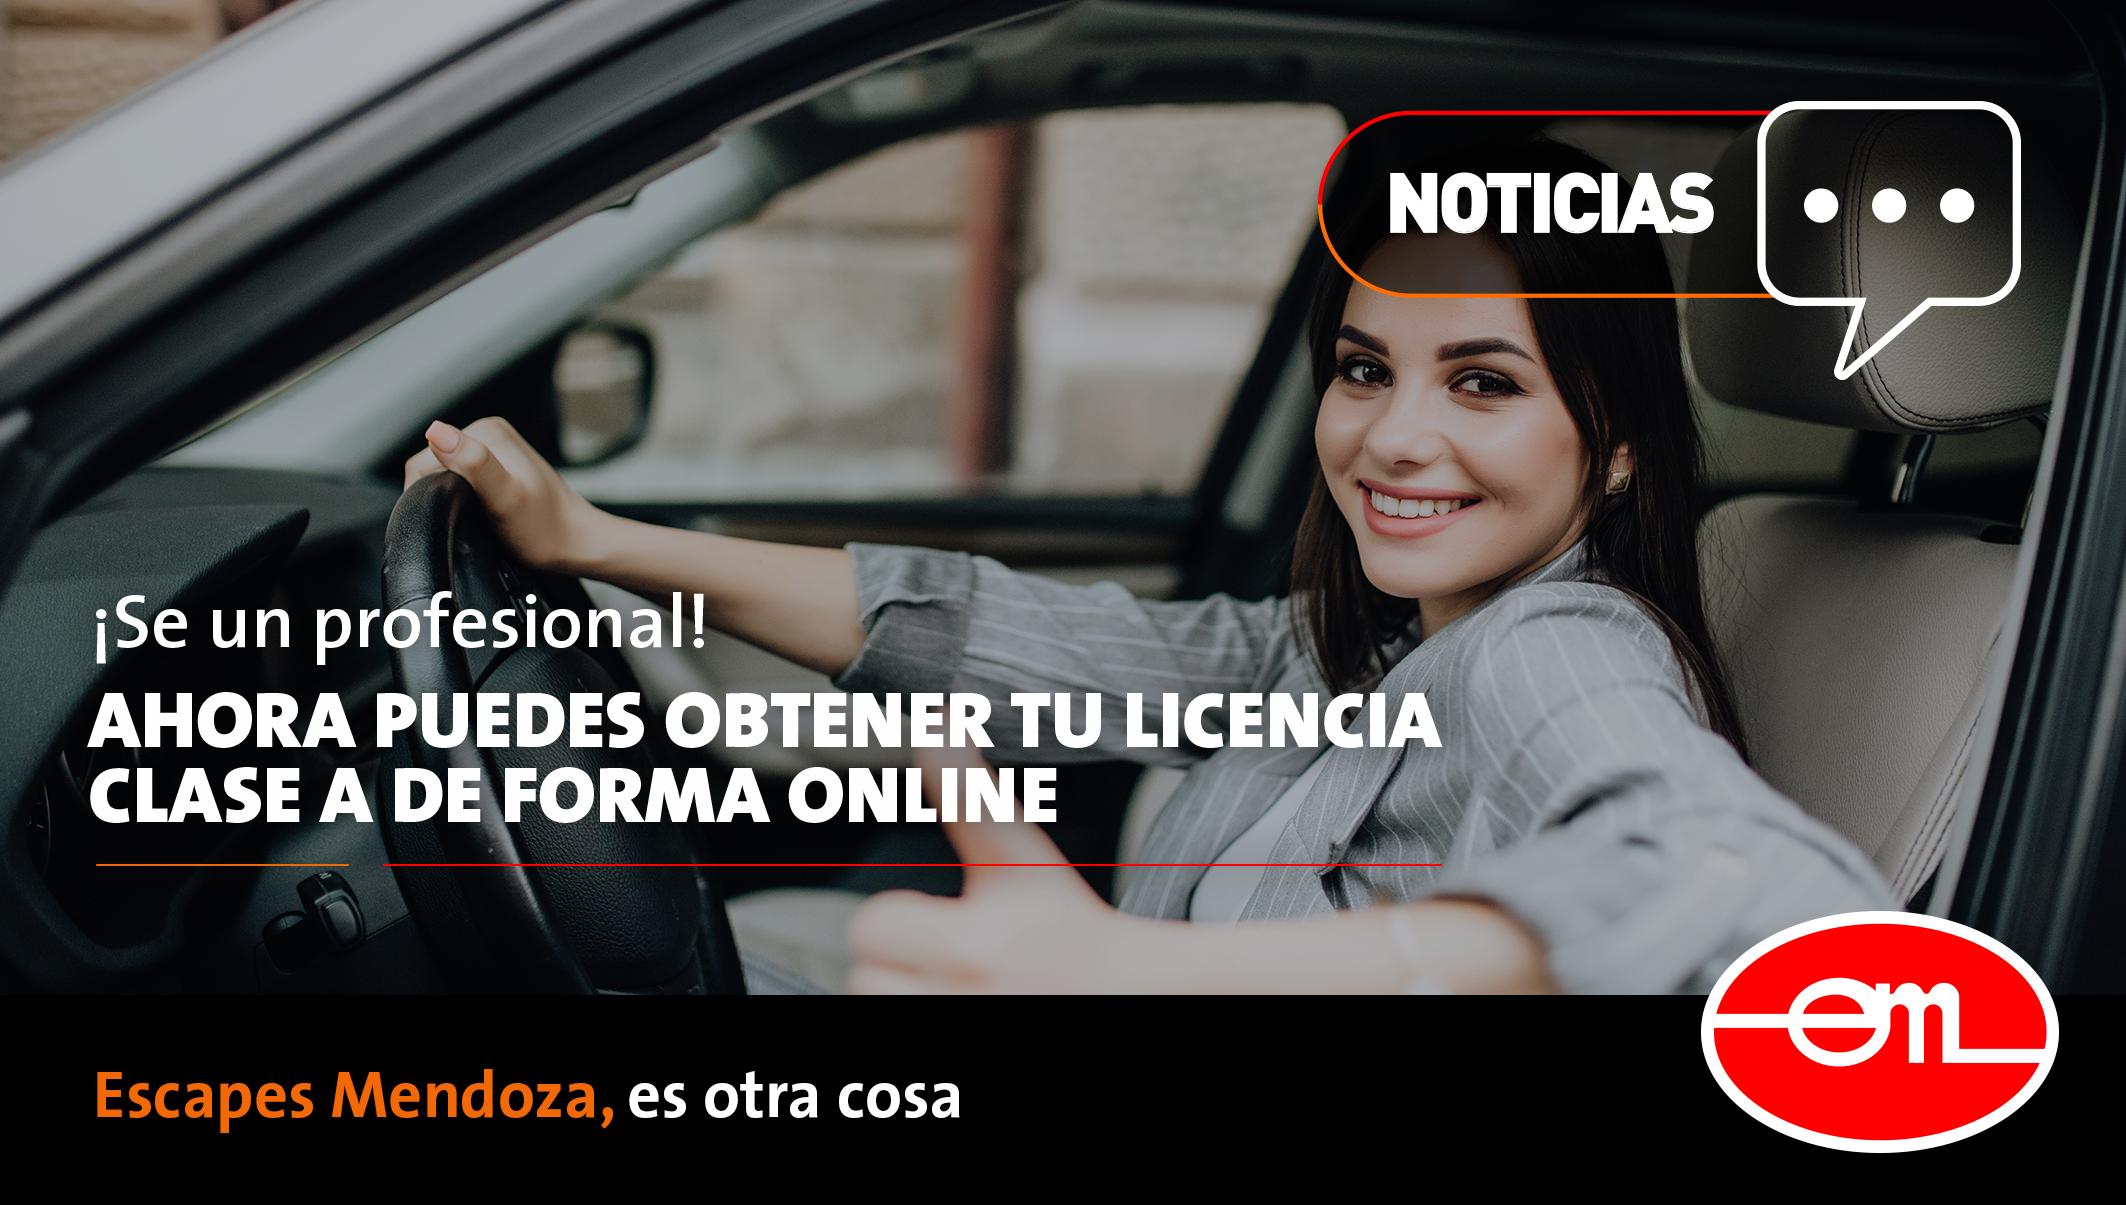 Obtén tu licencia clase a online